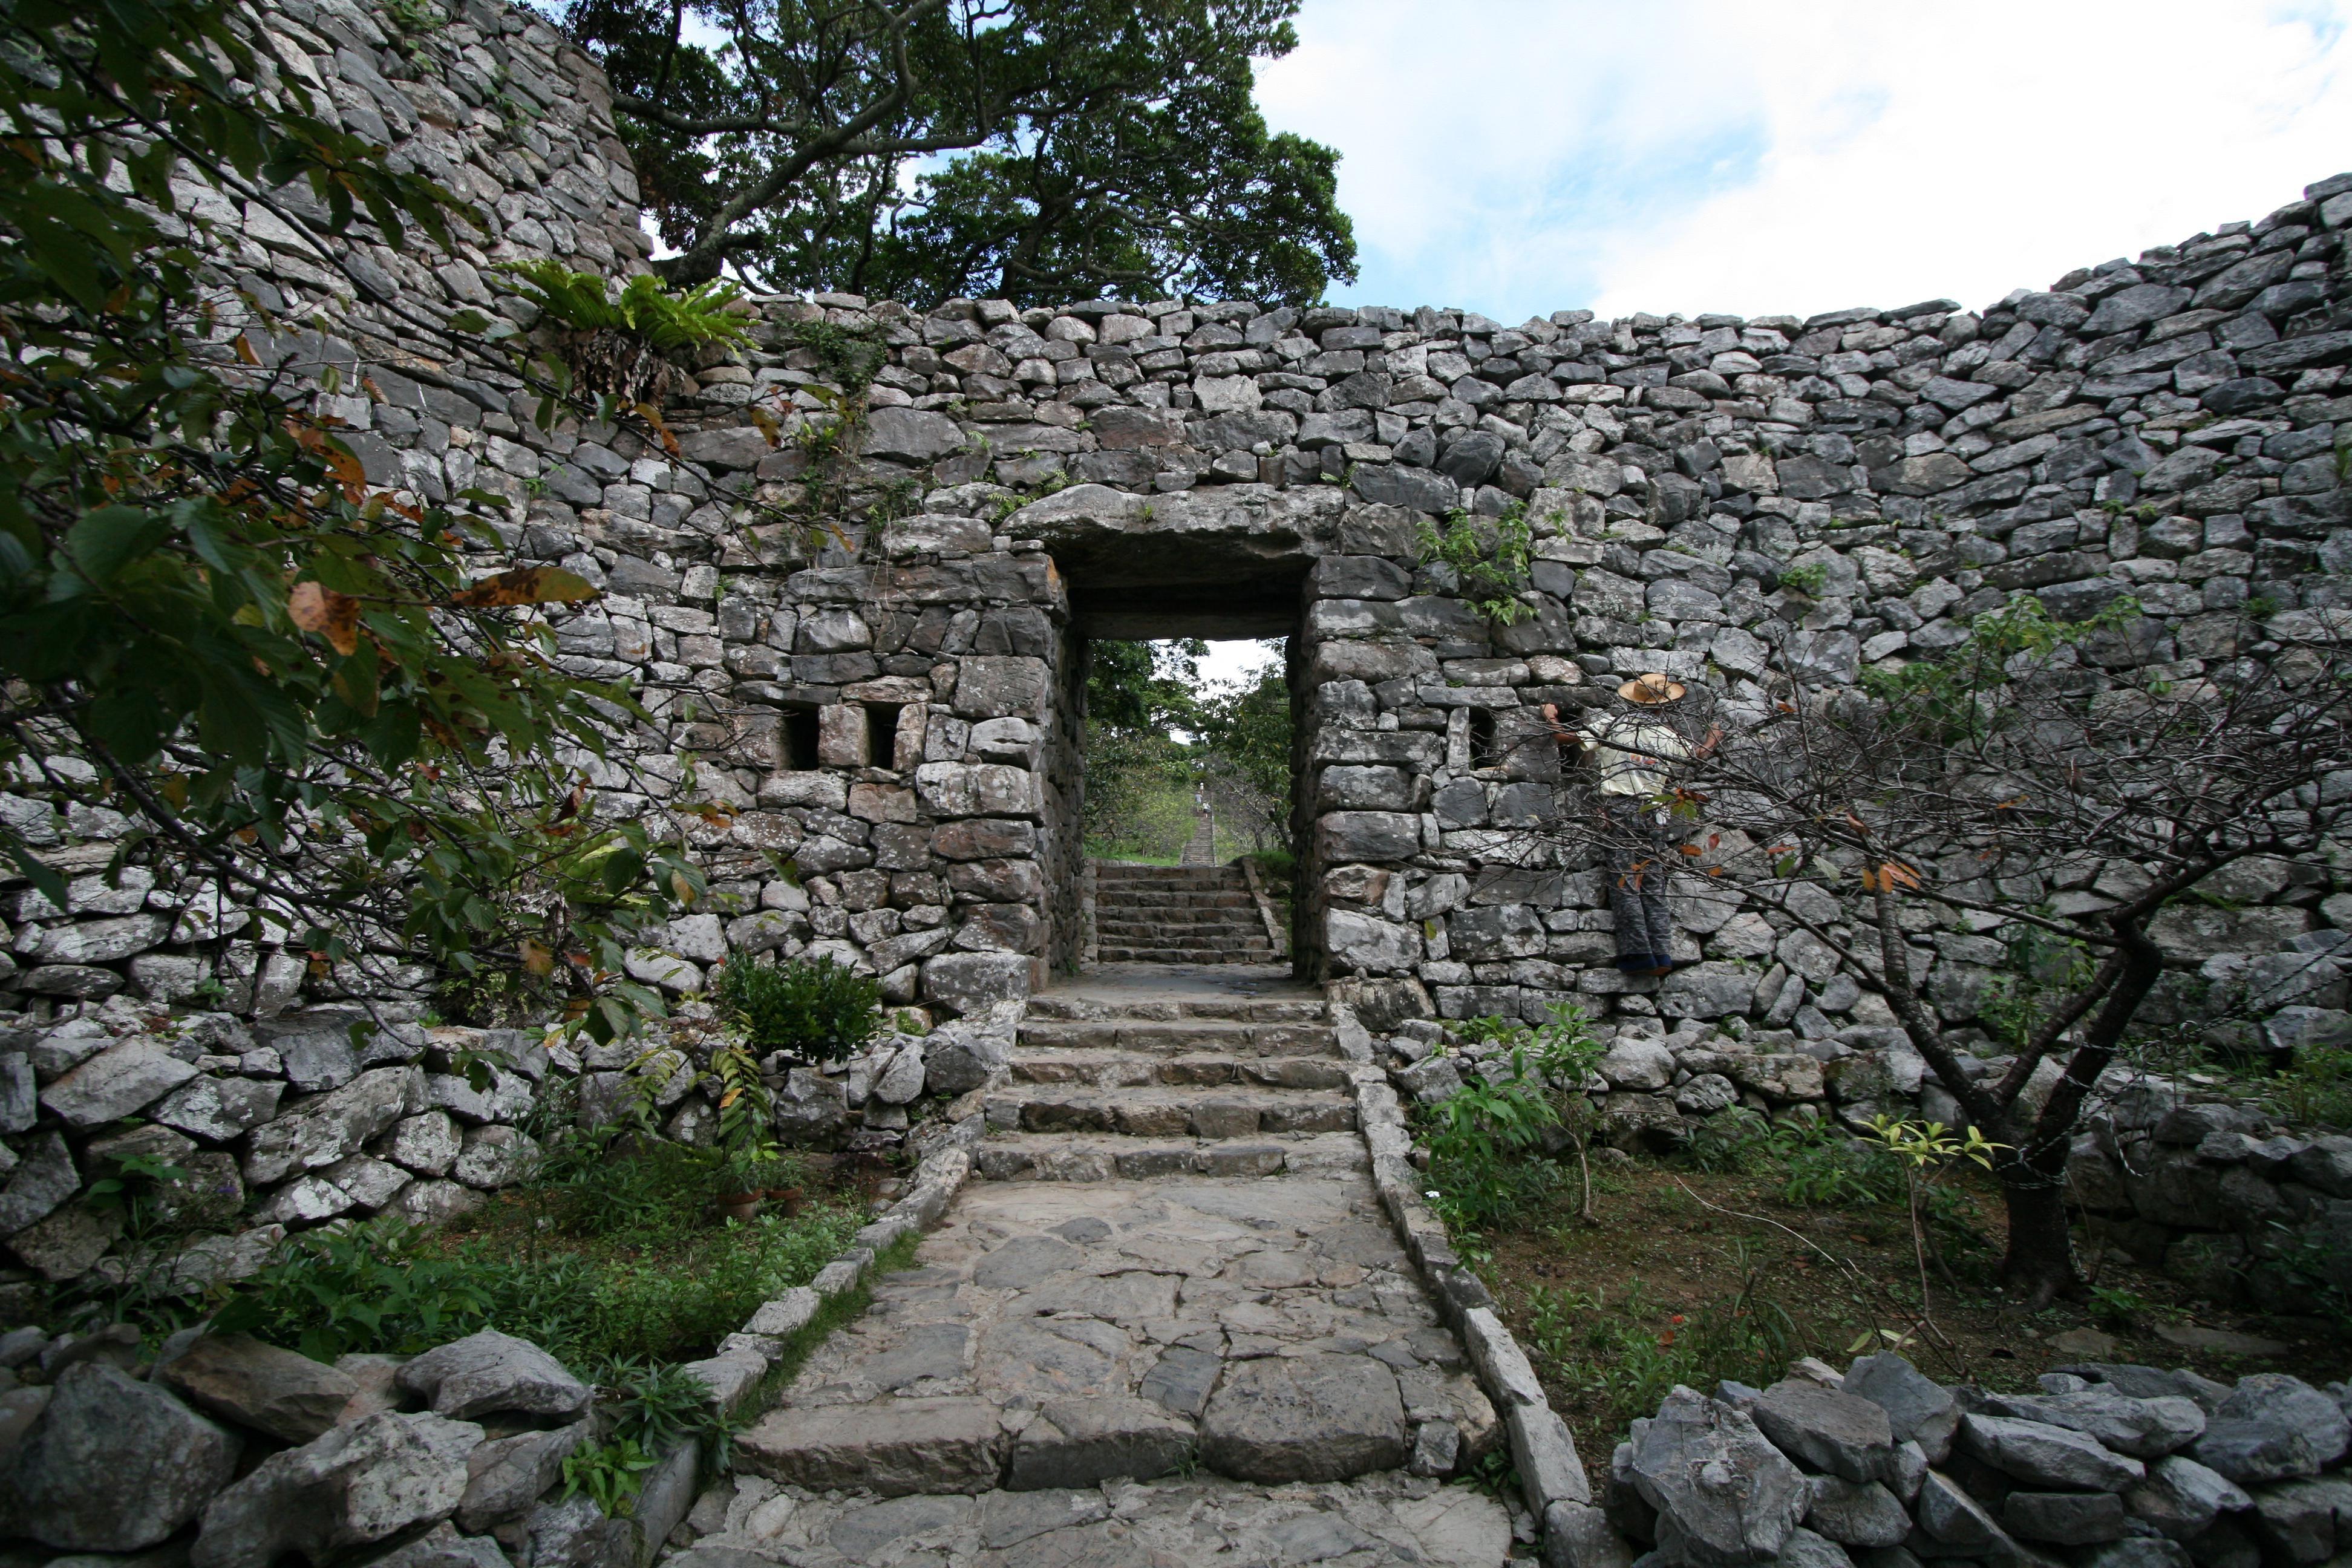 Scenery View Of Zakimi Castle Ruins In Okinawa, Japan ... |Okinawa Japan Ruins